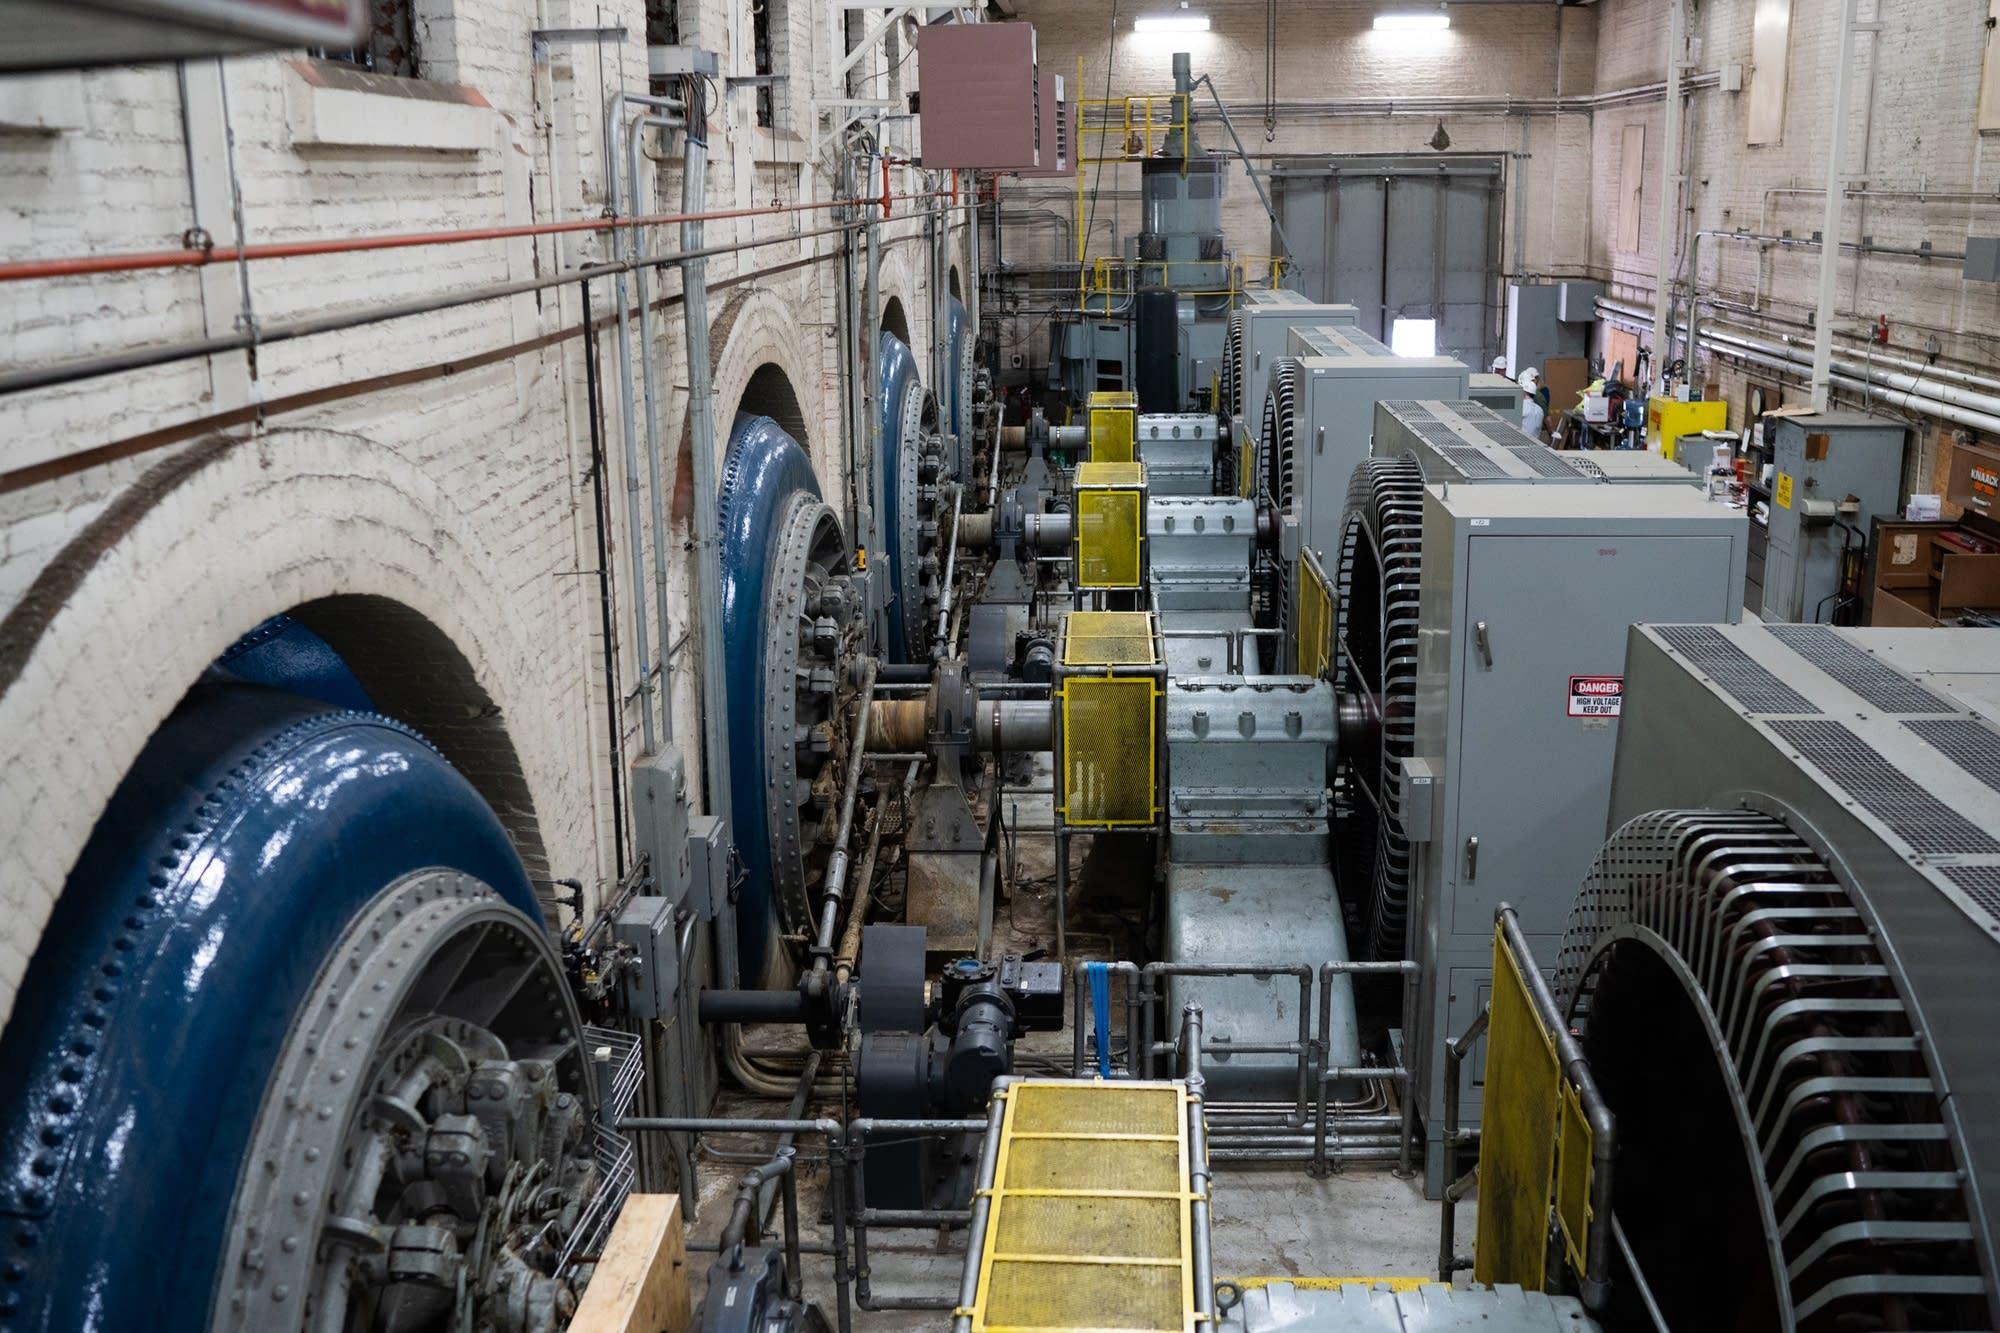 Five turbines spin inside the Hennepin Island Powerhouse.